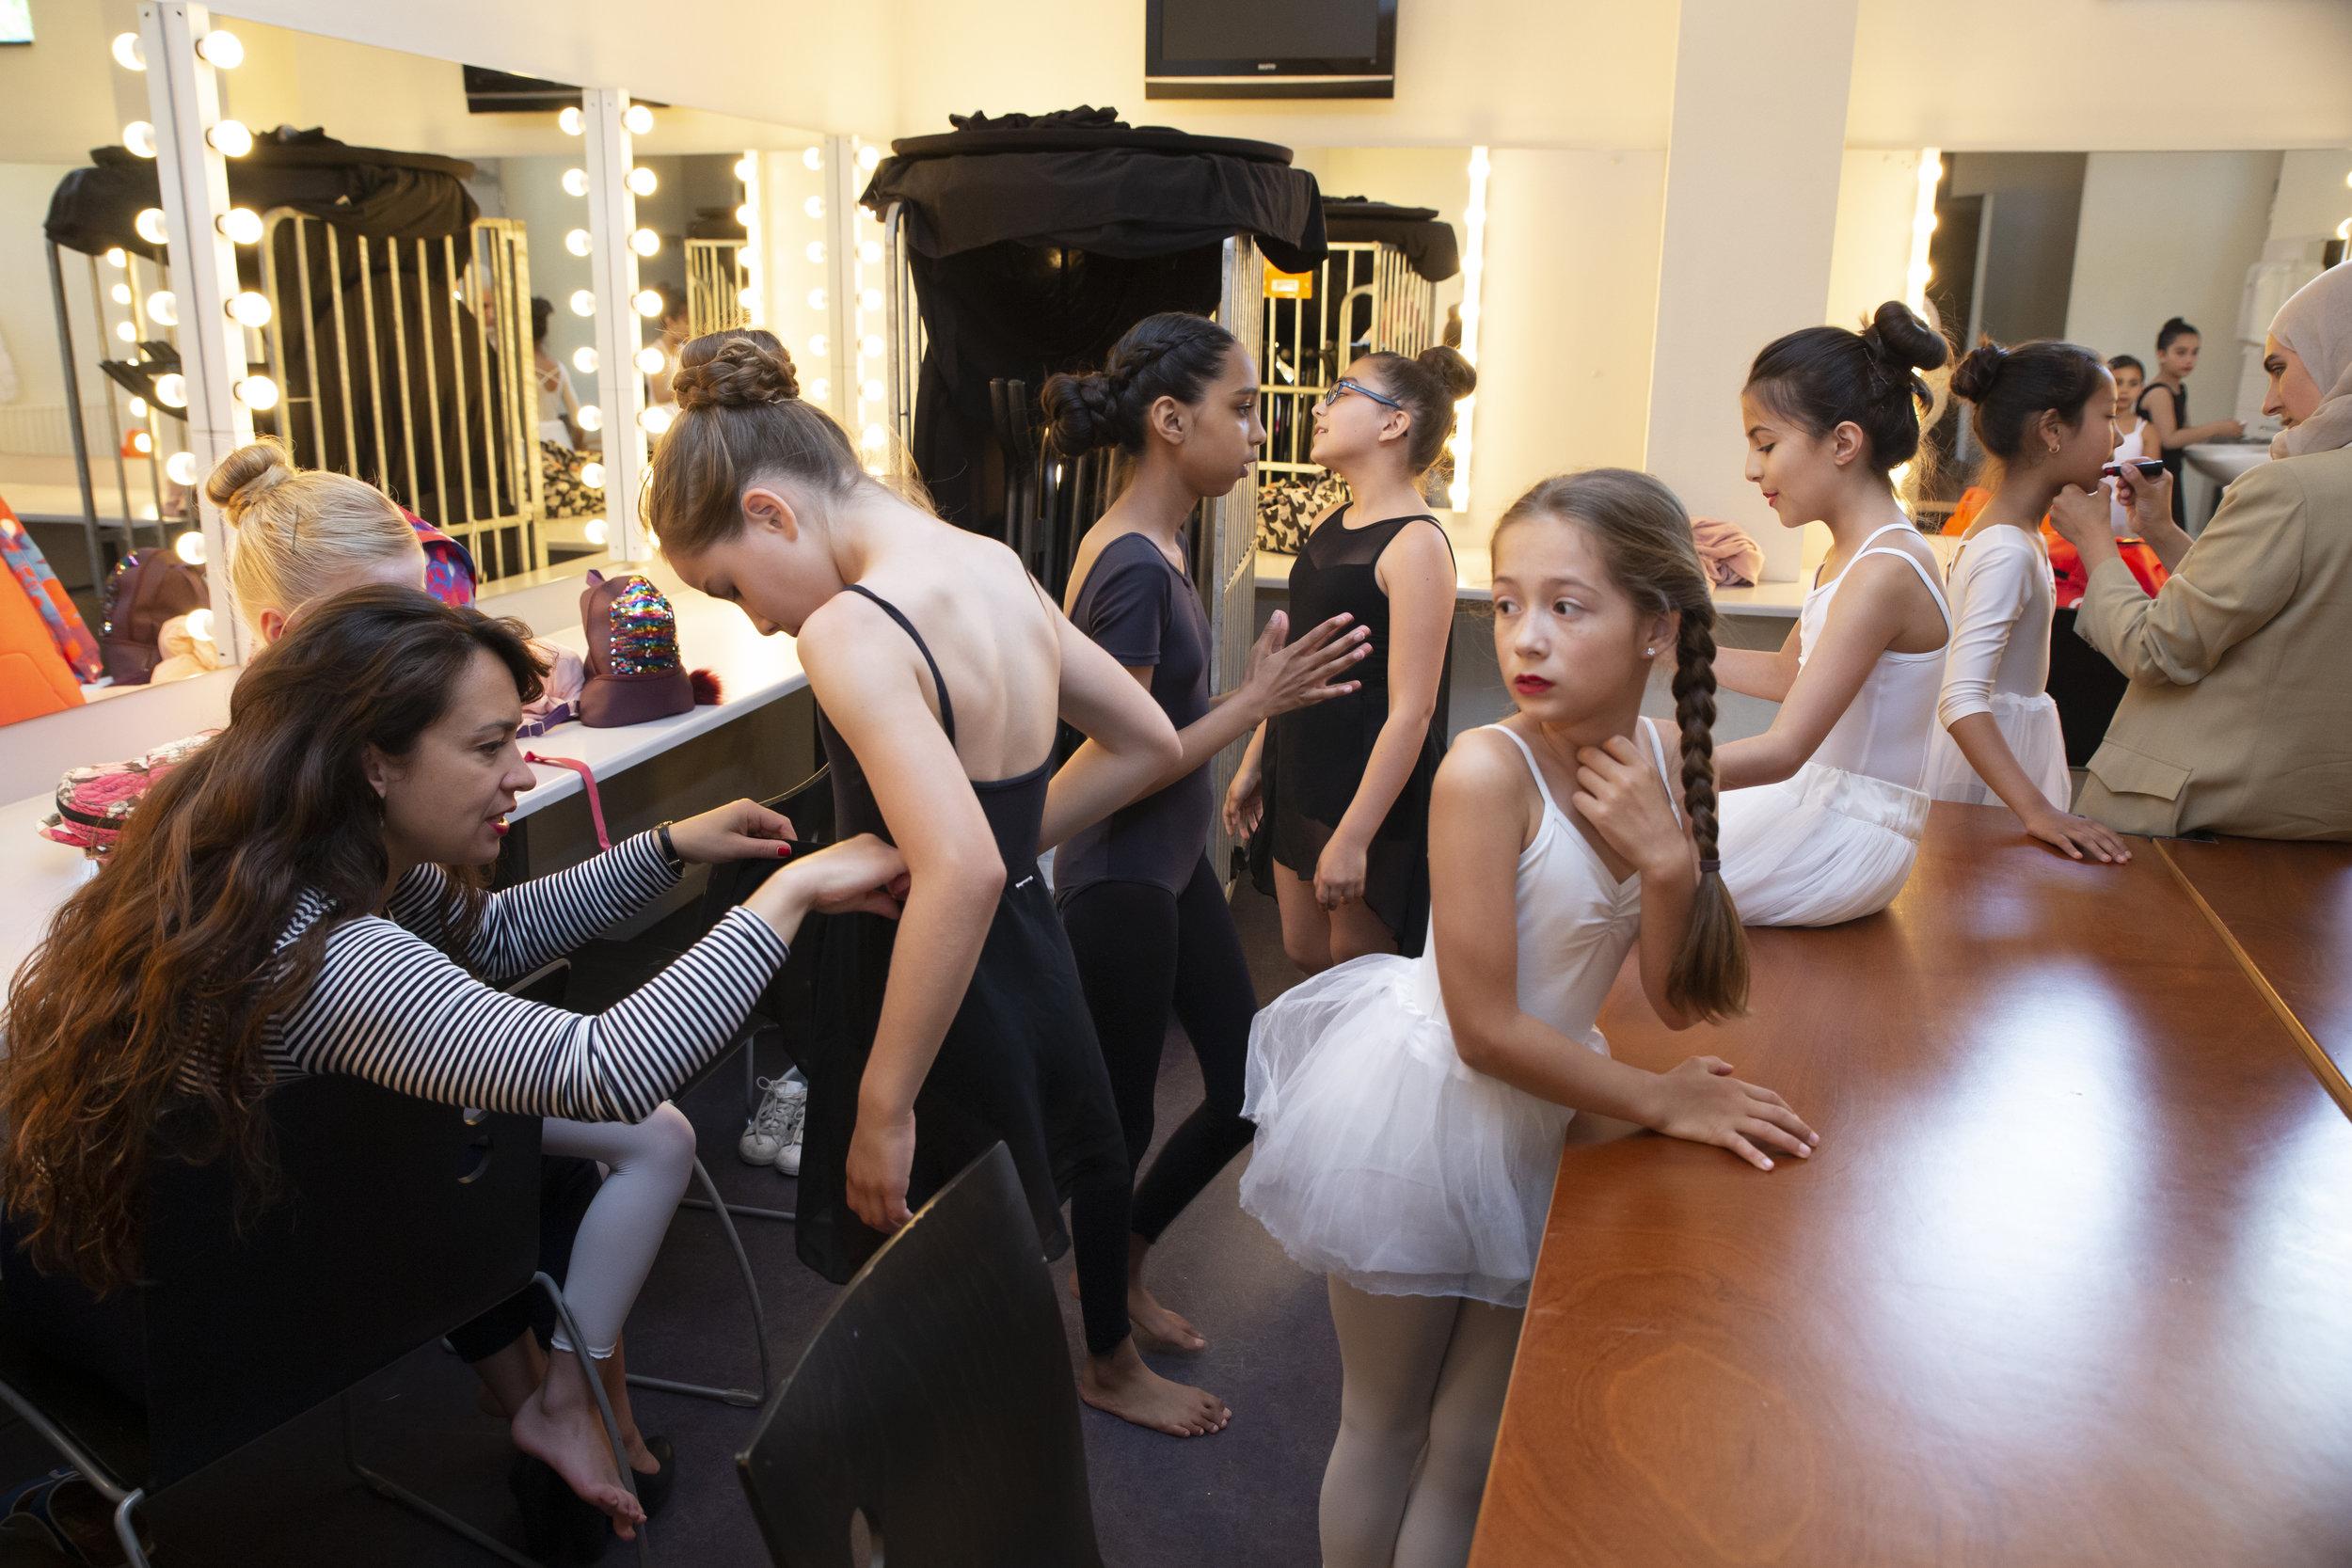 balletgroep lynn bartels van meervaart jong 011.JPG